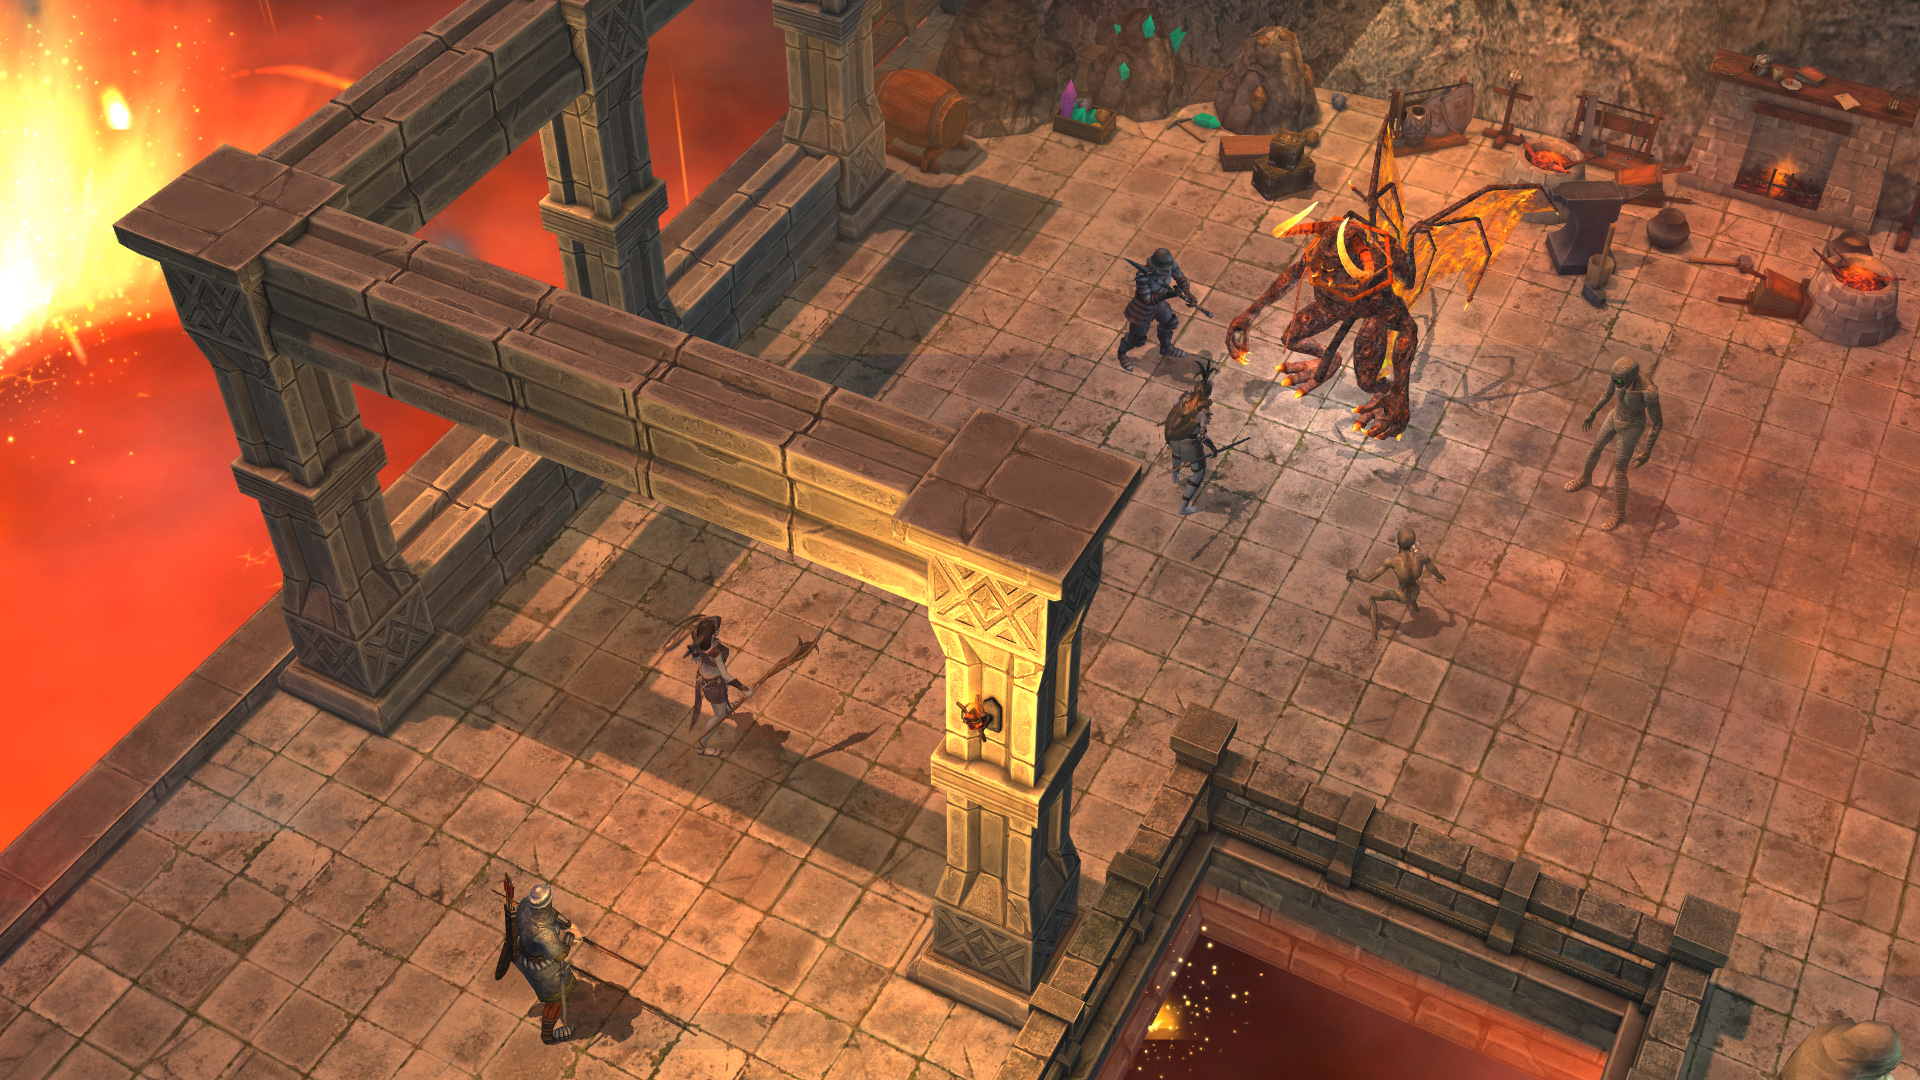 The Storm Guard: Darkness Screenshot 3